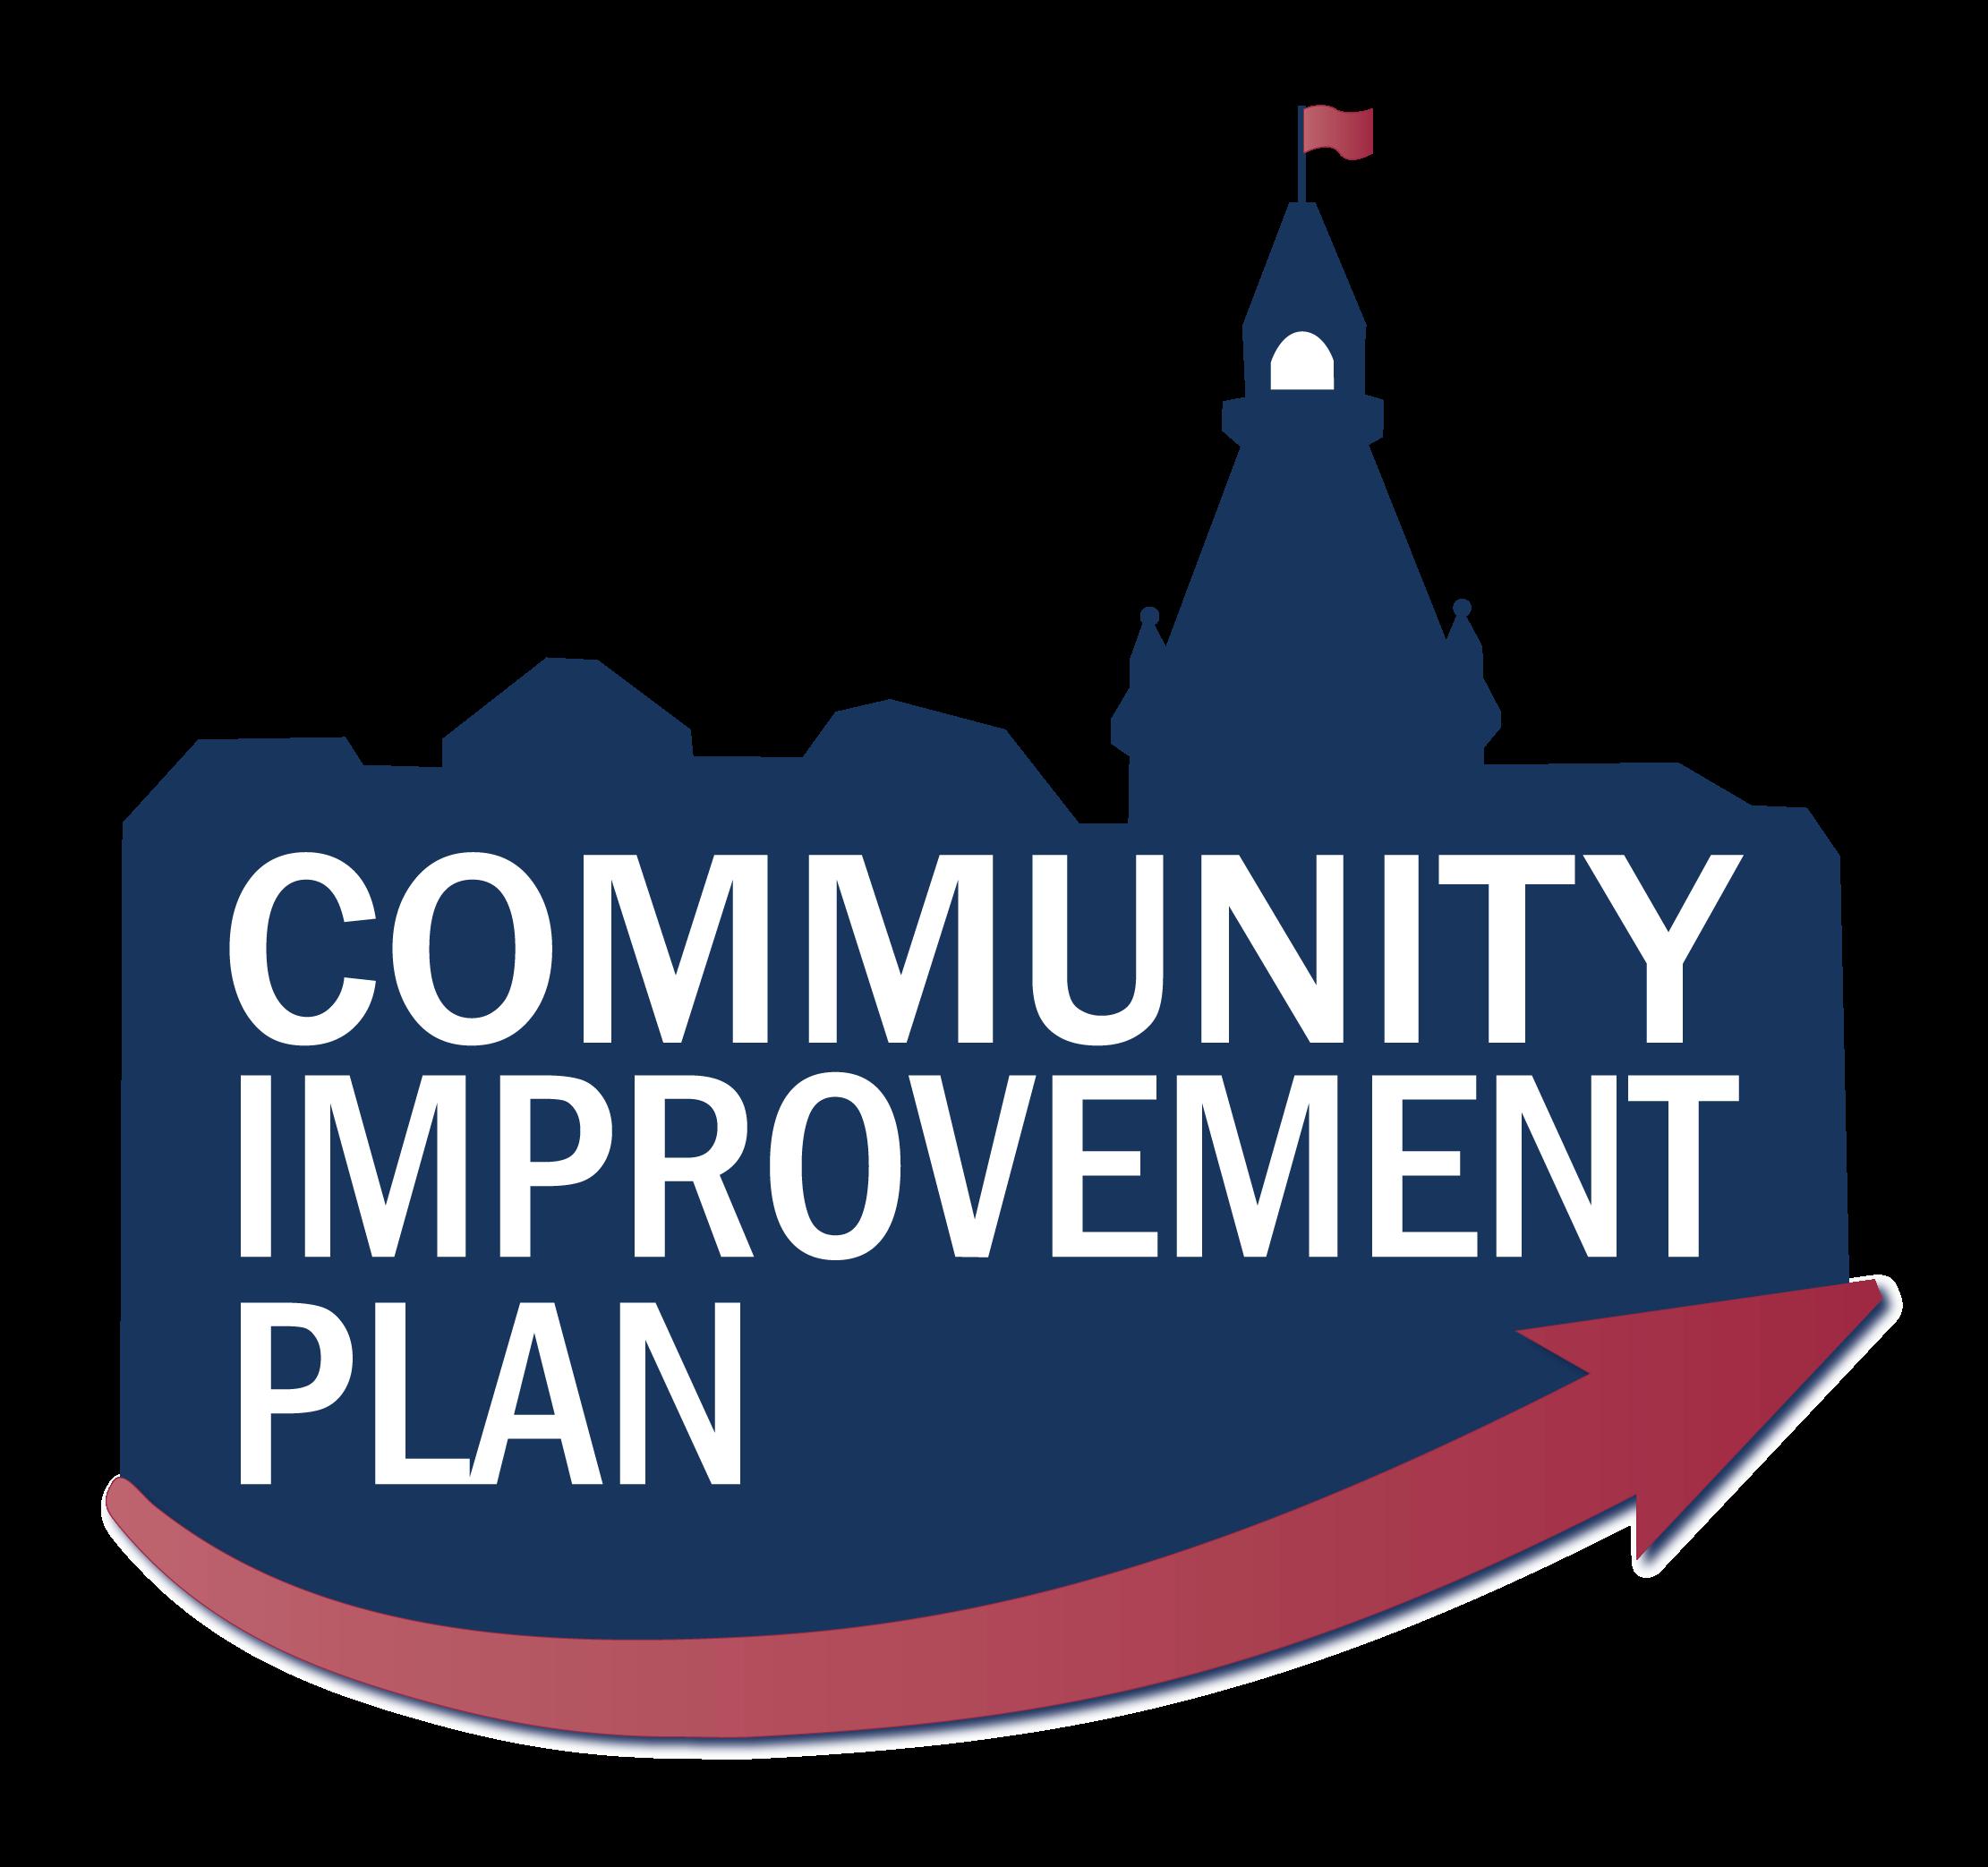 Community Improvement Plan logo